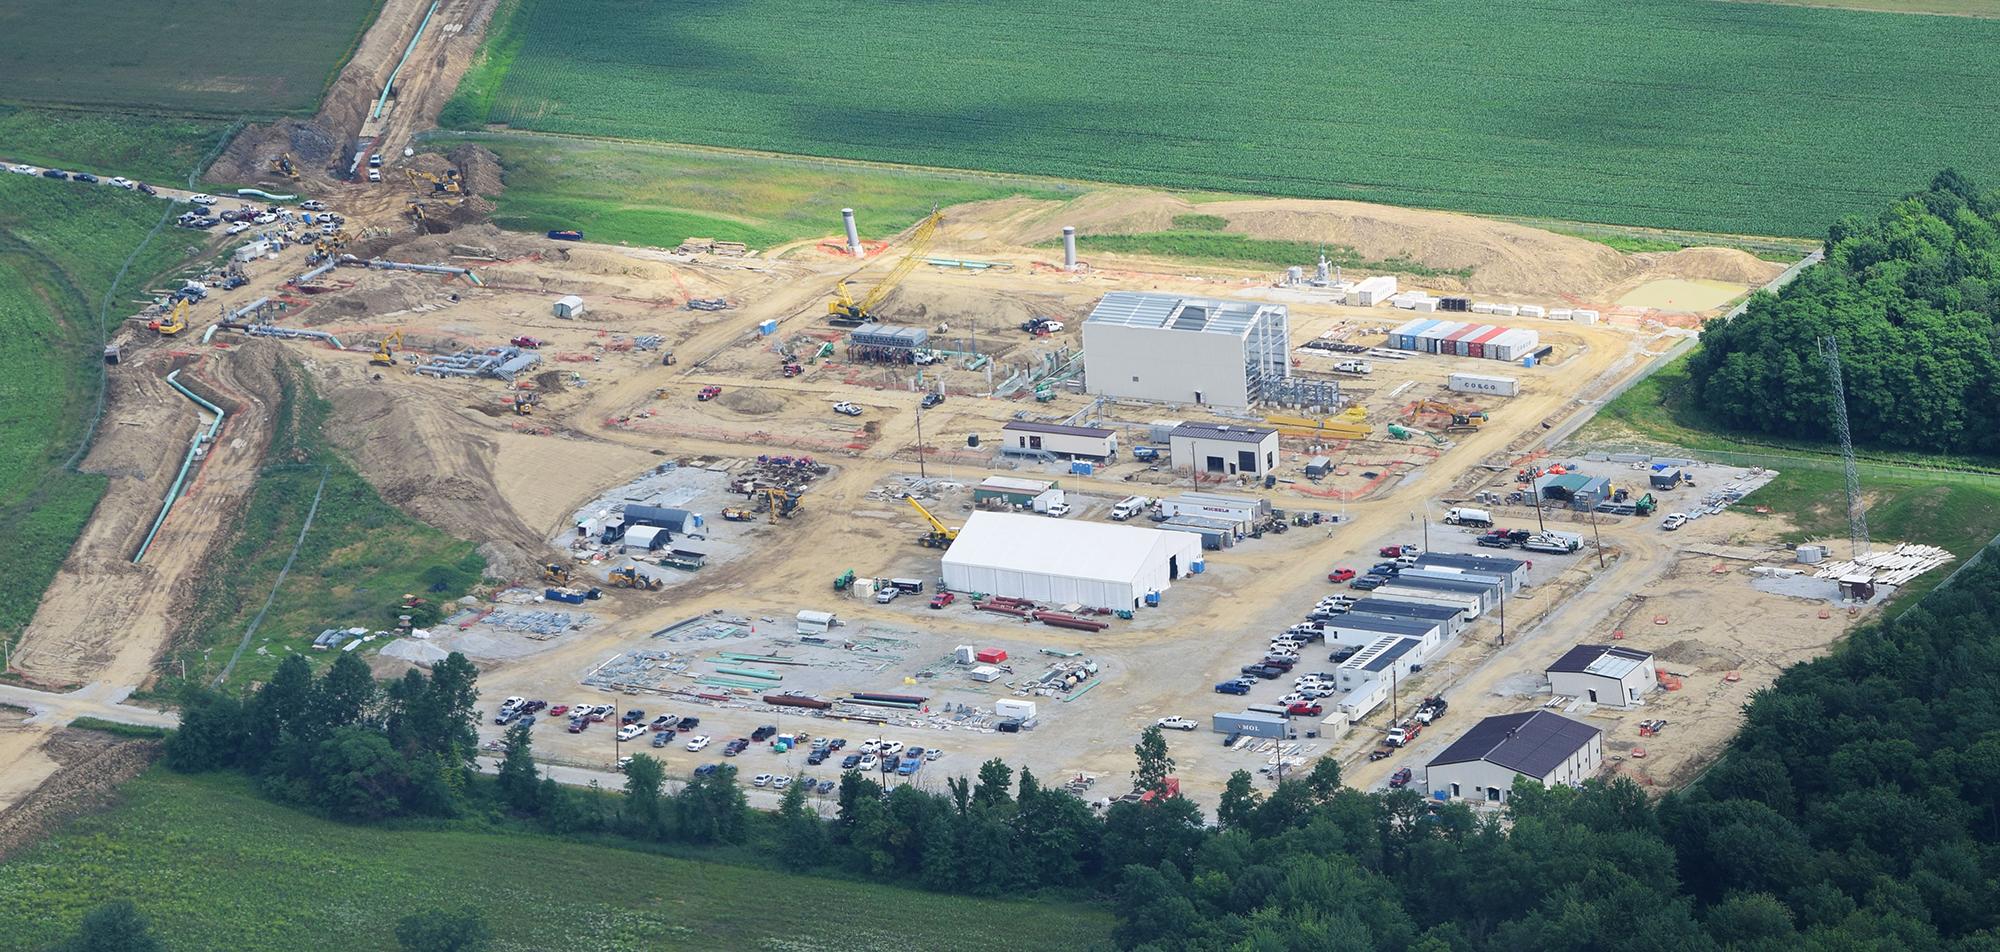 Wadsworth compressor station (under construction). Medina County, OH.